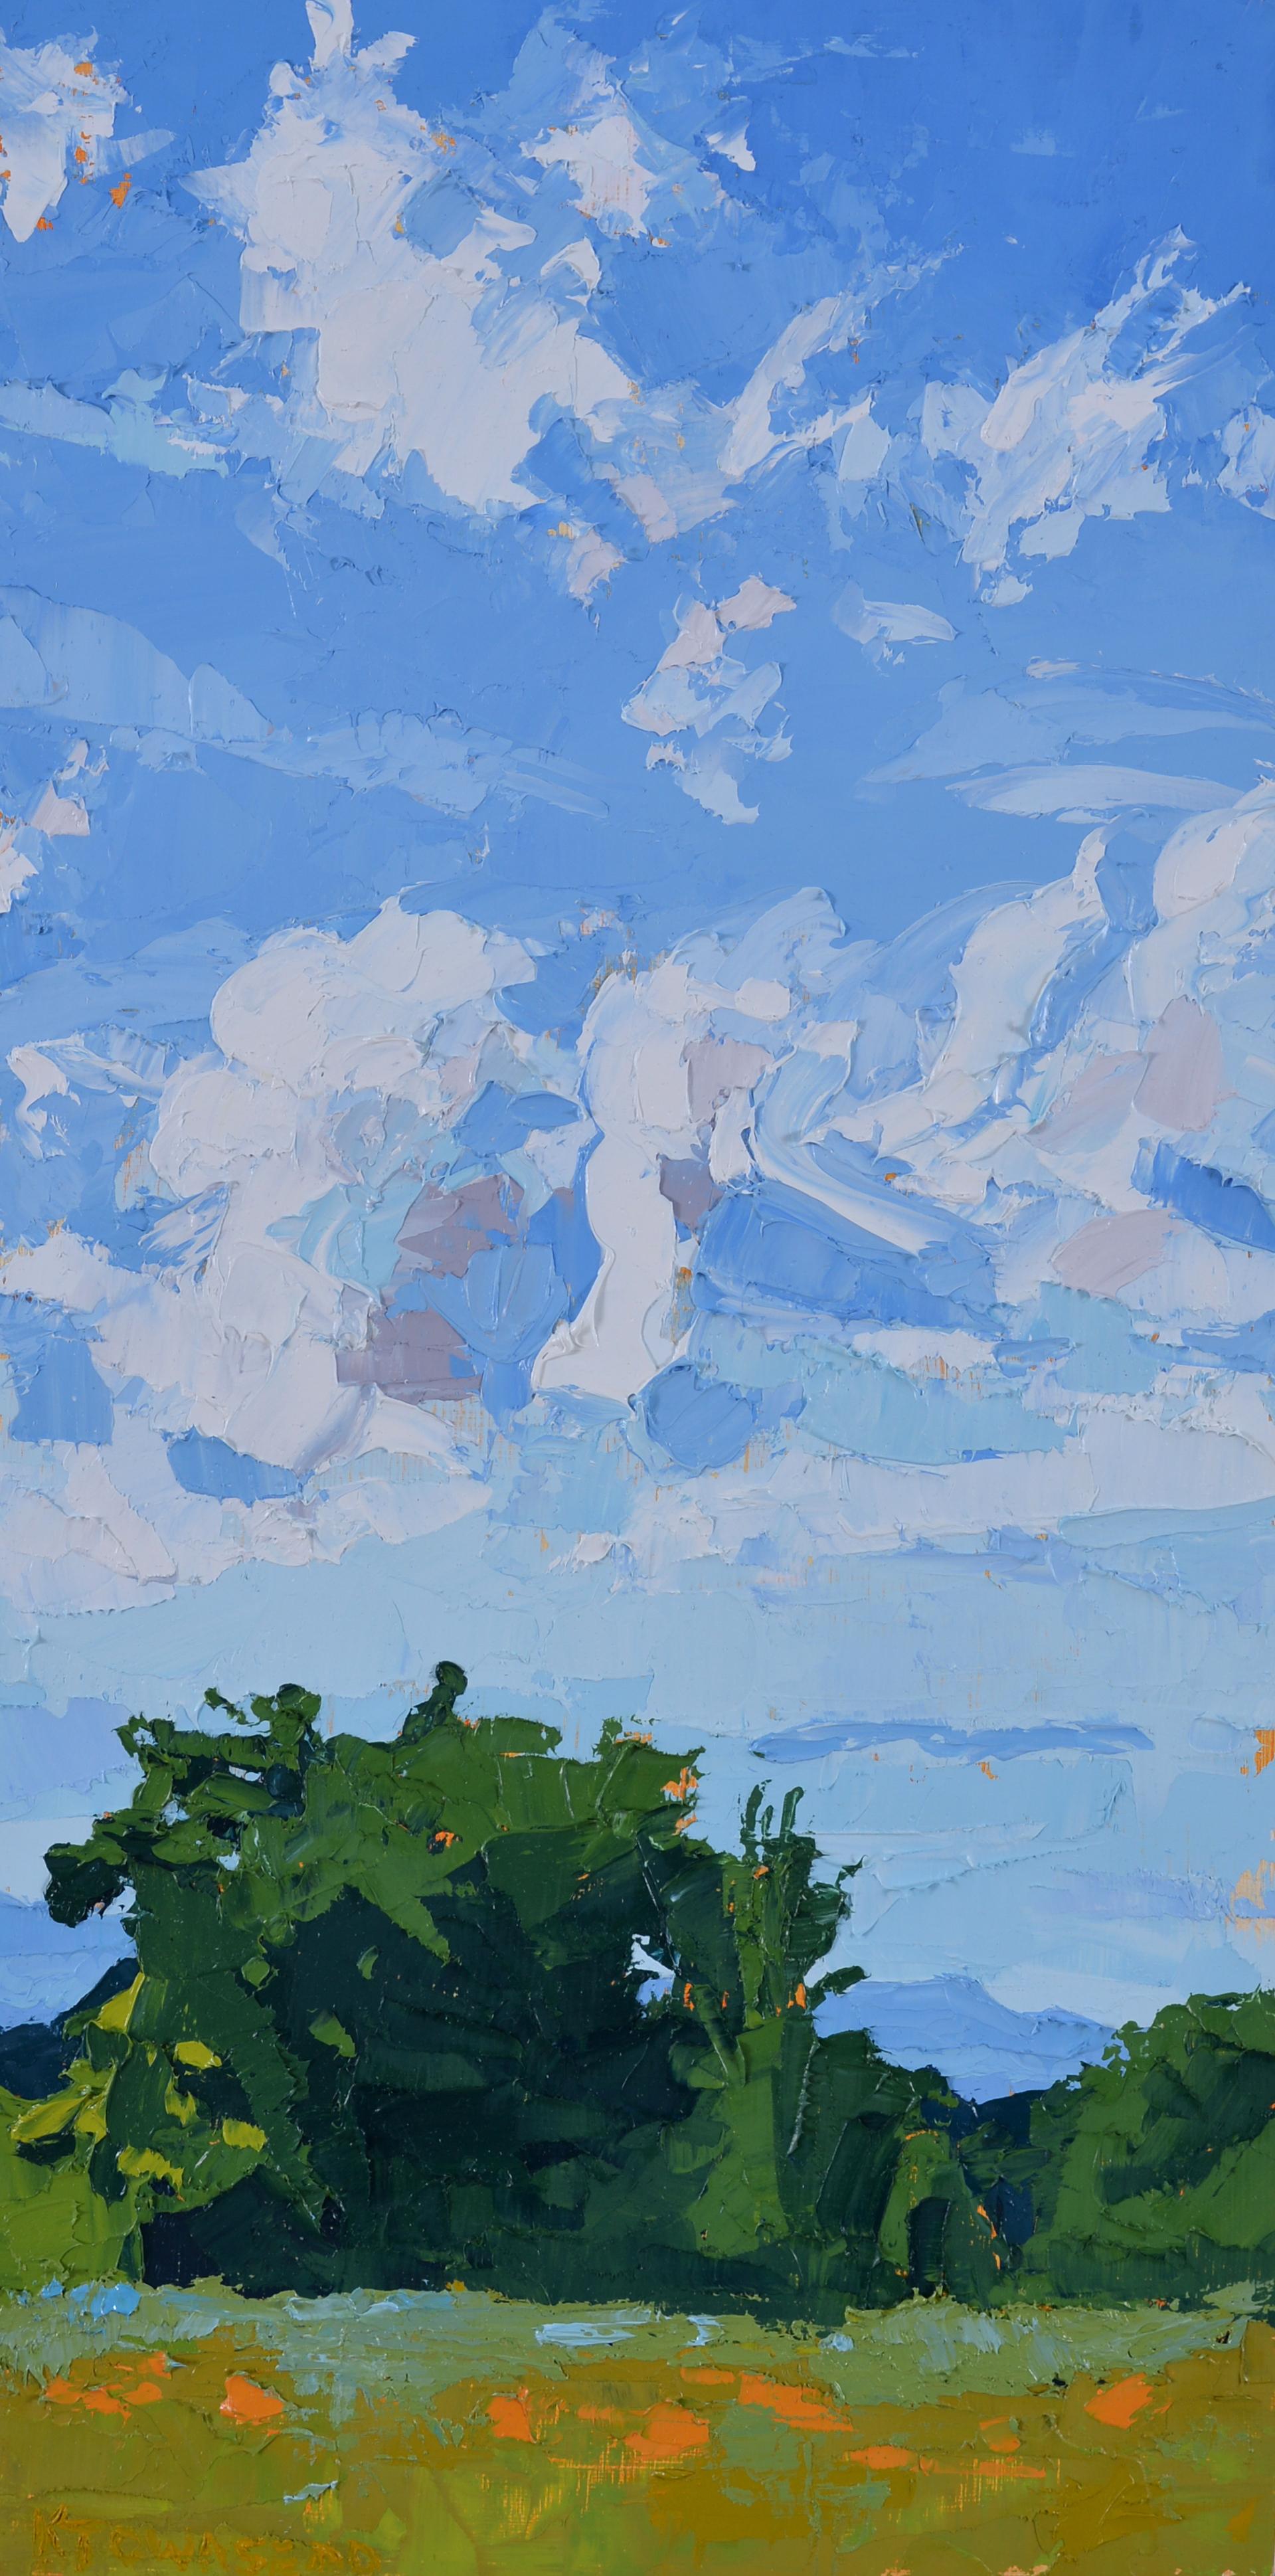 Windy Skies by Krista Townsend